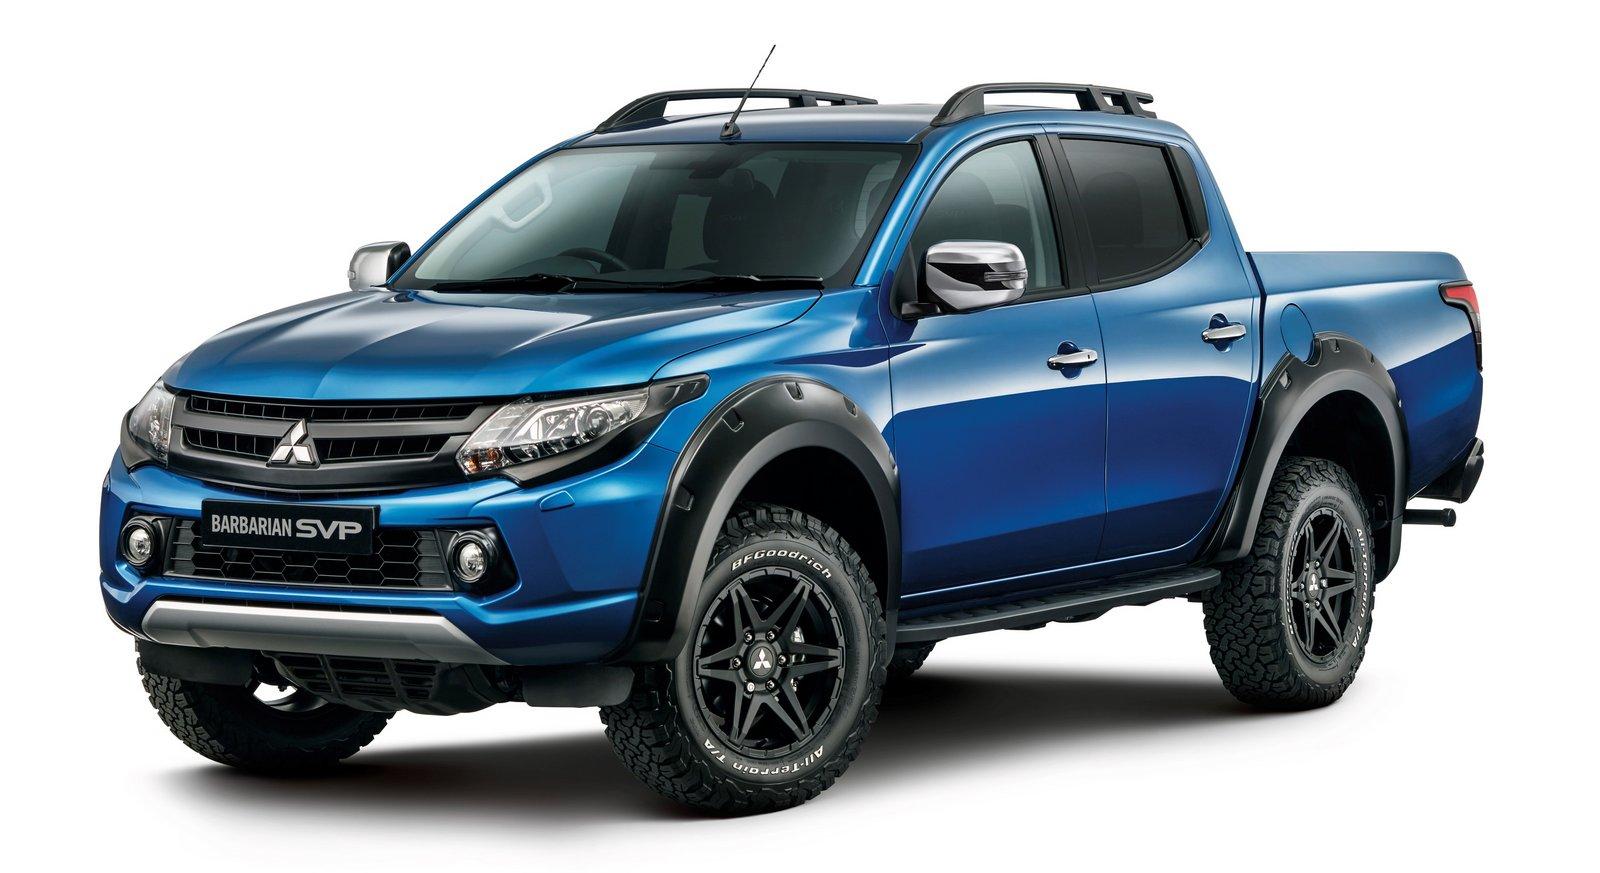 2015 - [Mitsubishi / Fiat] L200 - Triton / Fullback - Page 3 Mitsubishi-L200-Barbarian-SVP-2